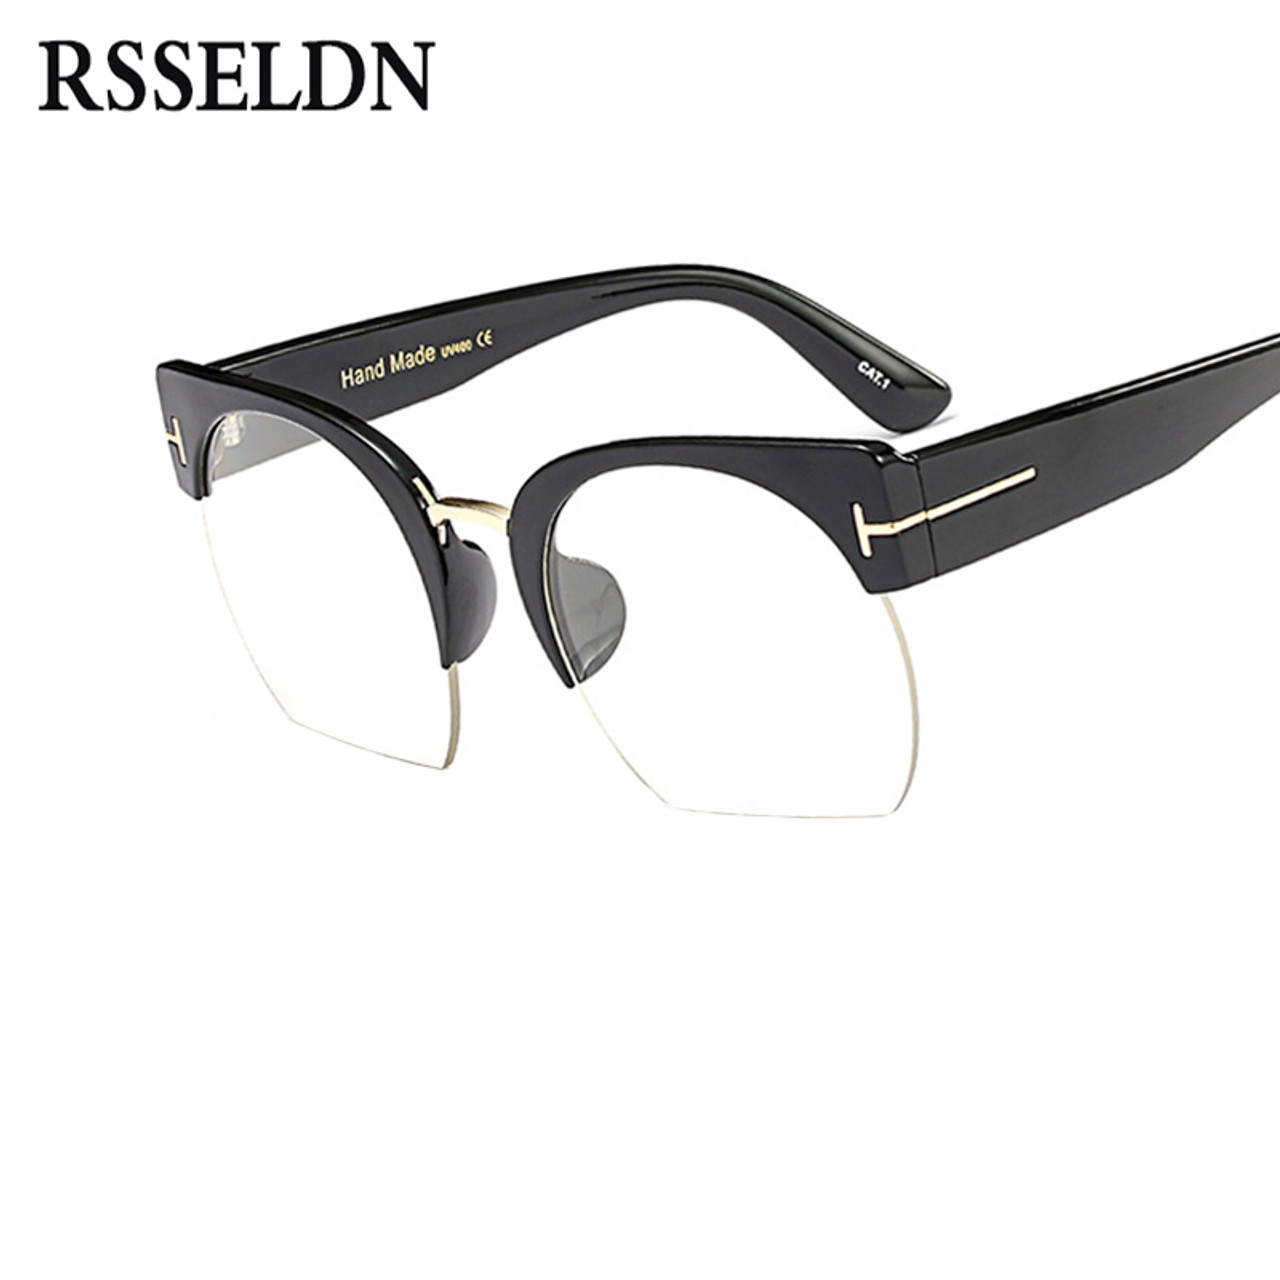 5430c74b3e7 ... RSSELDN Newest Semi-Rimless Sunglasses Women Brand Designer Clear Lens  Sun Glasses For Women Fashion ...